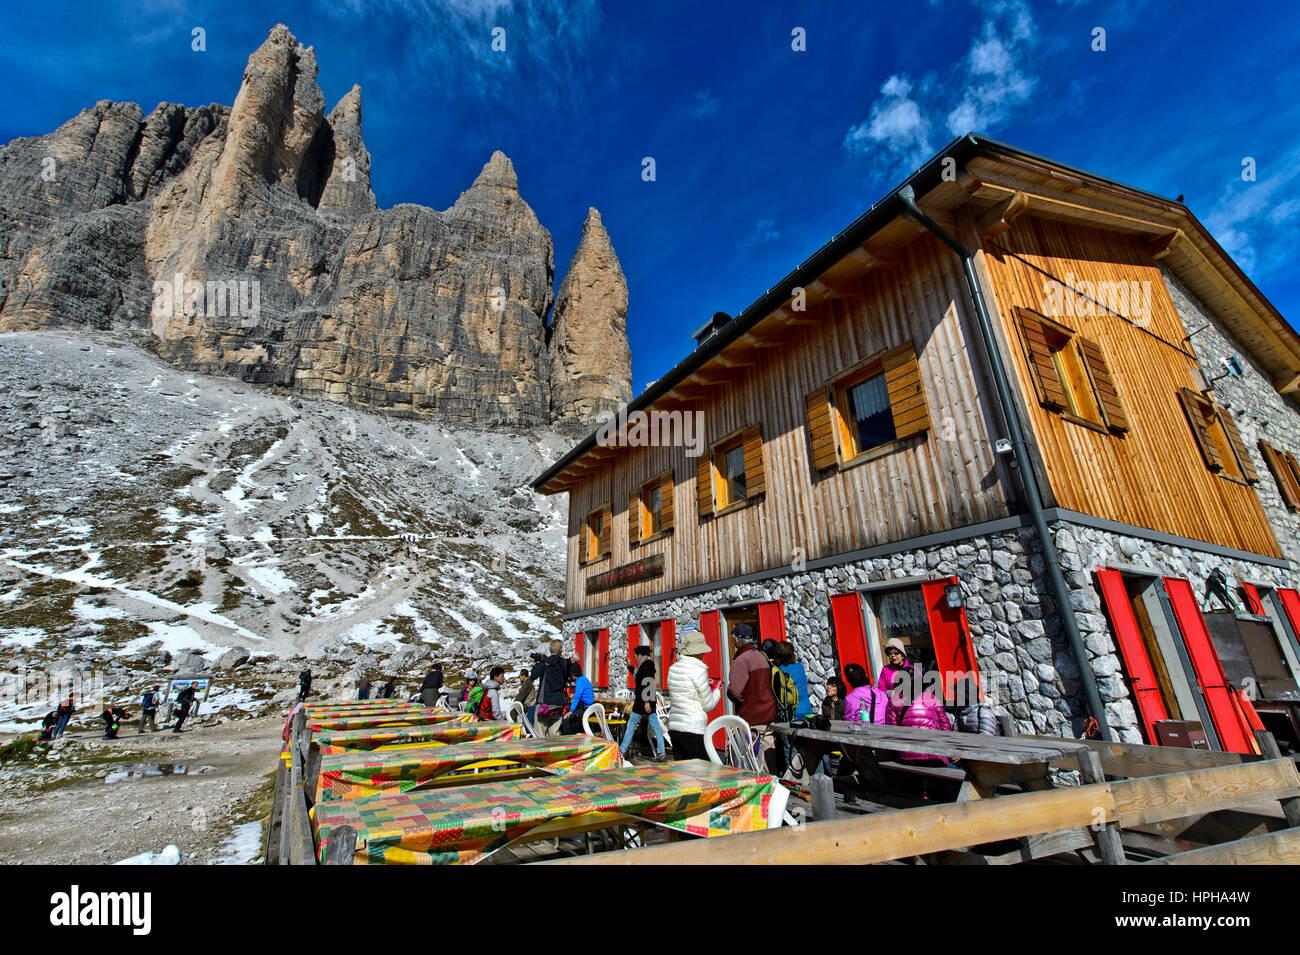 Mountain hut Rifugio Lavaredo at the foot of the Three Peaks Mountains, Sexten Dolomites, South Tyrol,Trentino-Alto - Stock Image